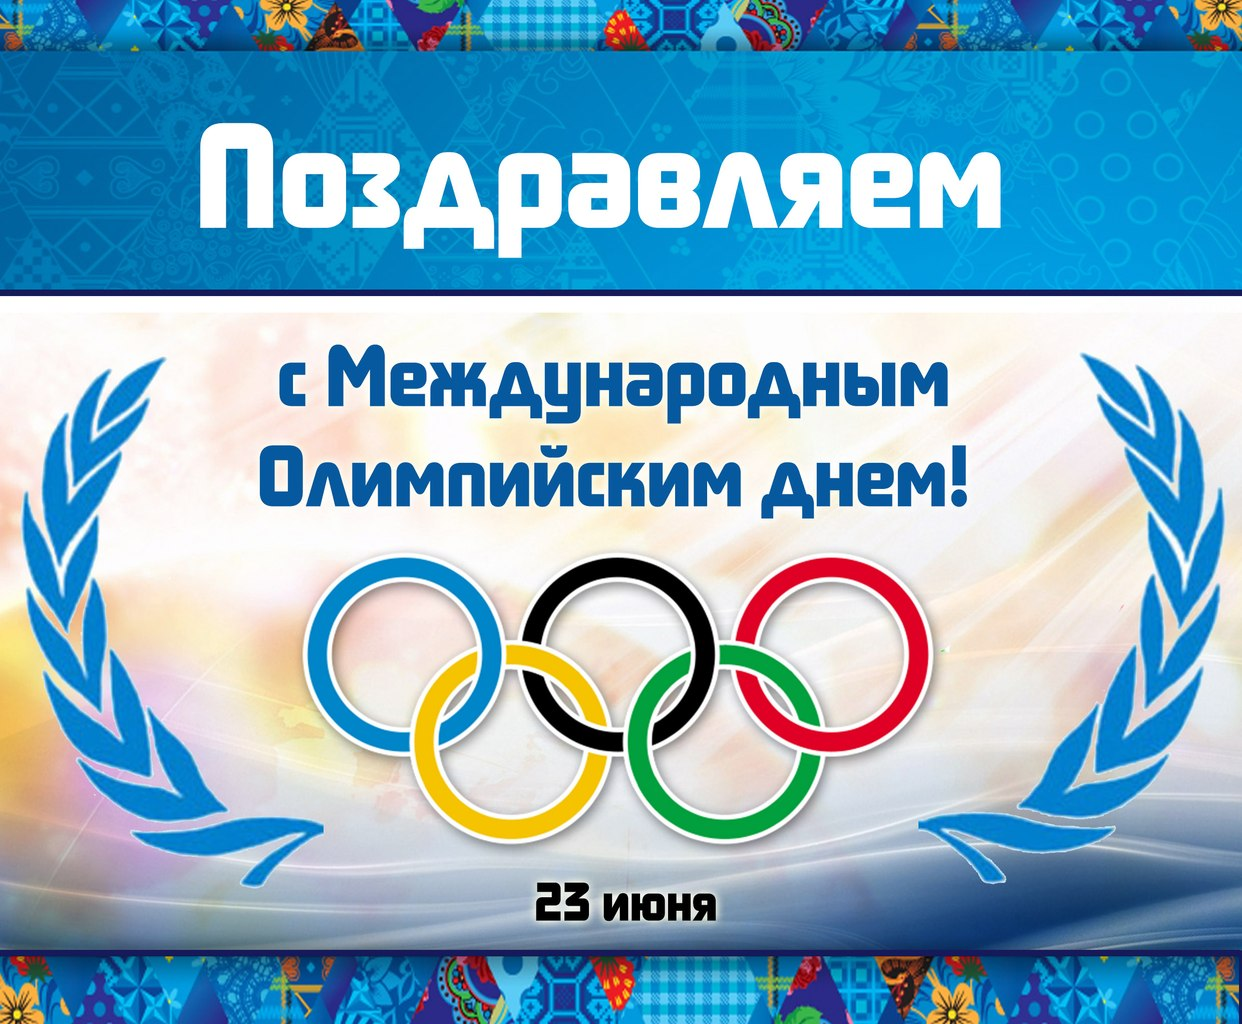 Картинки с надписью олимпиада, божьей